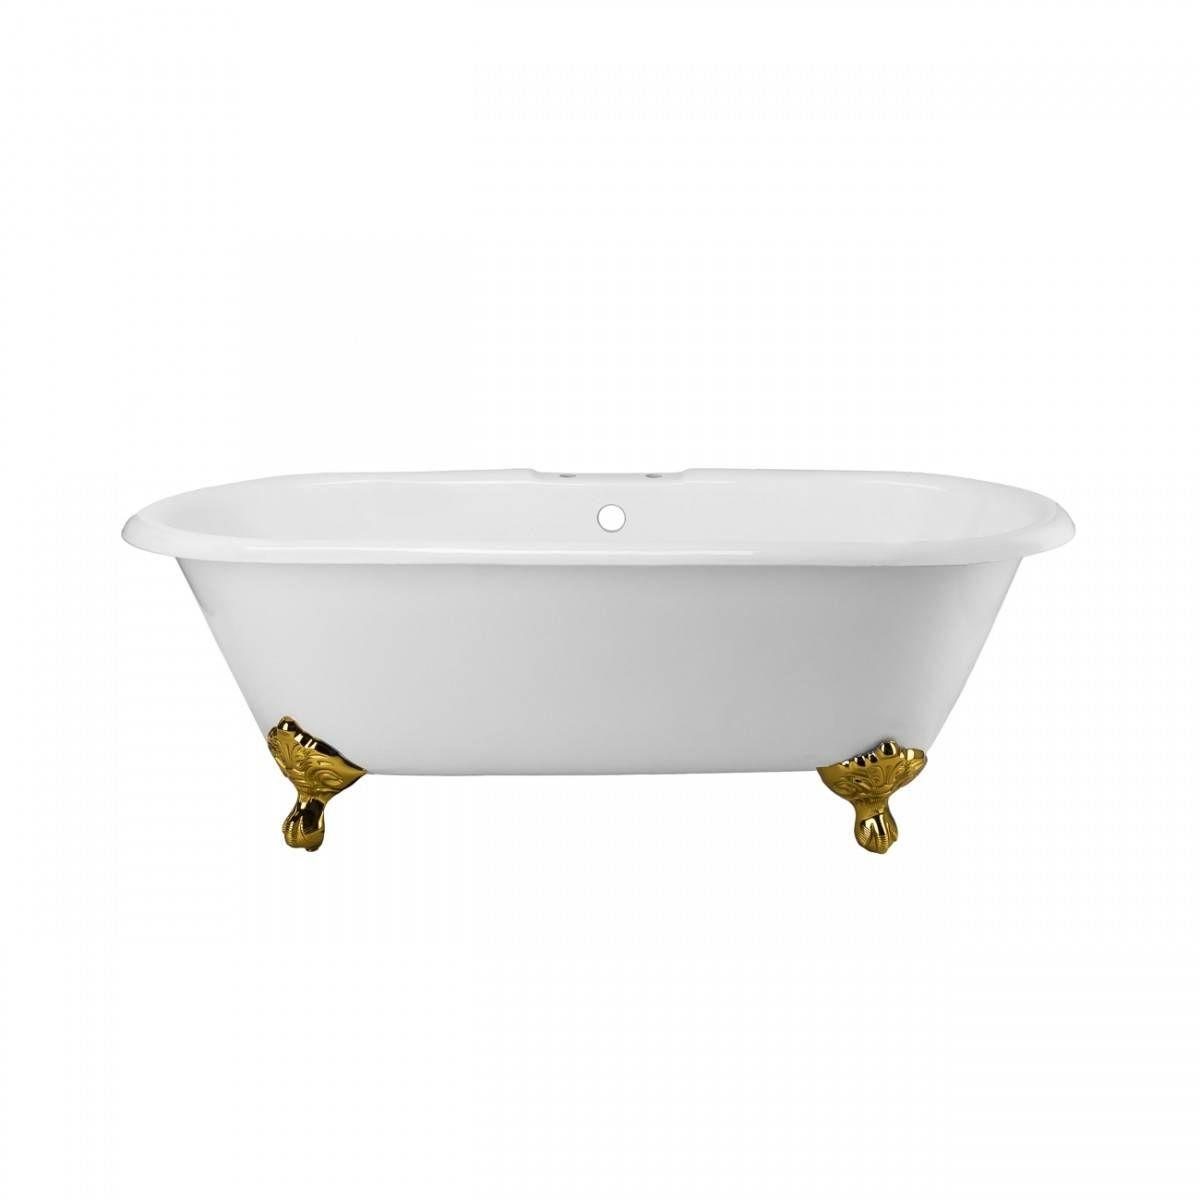 Cambridge Cast Iron Double Ended Clawfoot Tub Rim Faucet Drillings In 2020 Soaking Bathtubs Bathtub Tub